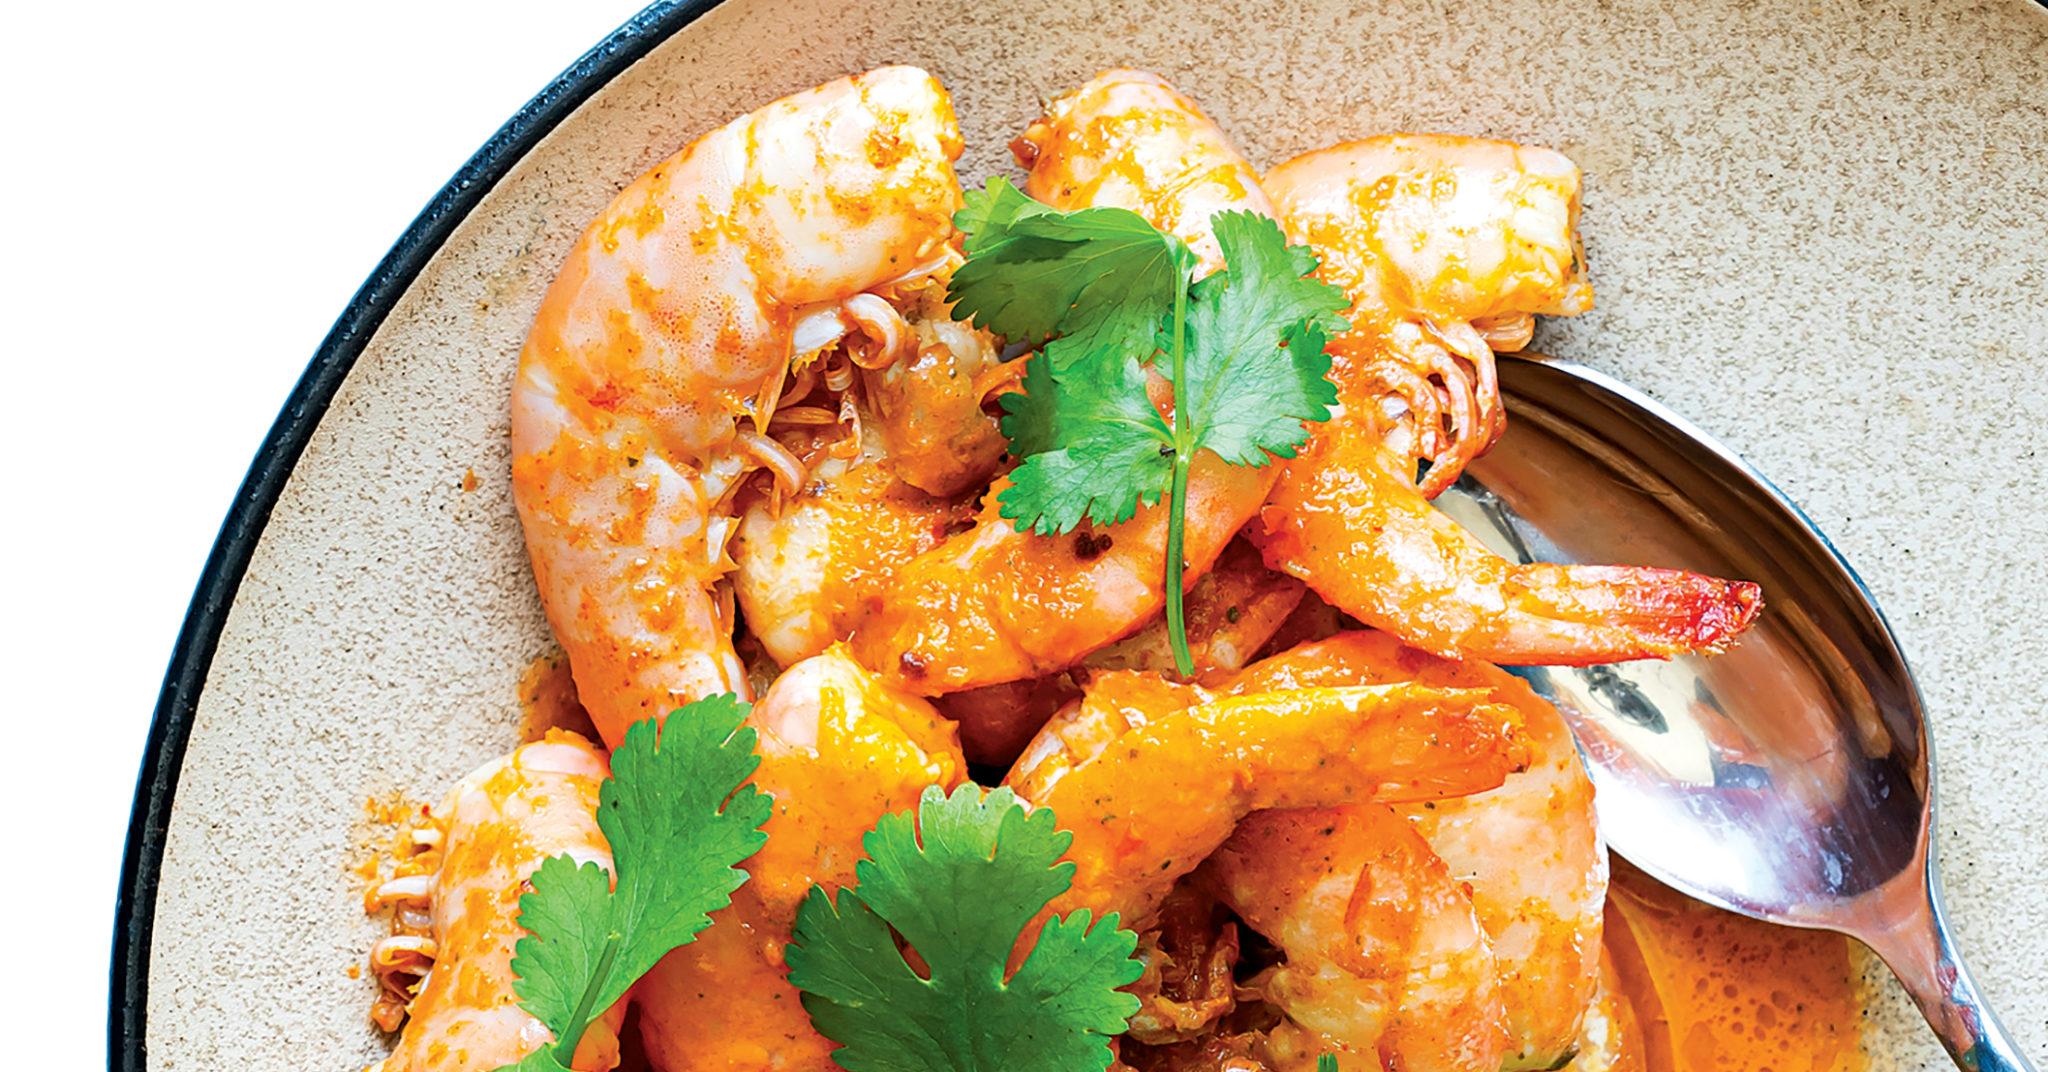 Piri-piri shrimp recipe from Erik Adjepong. Photograph by Scott Suchman.